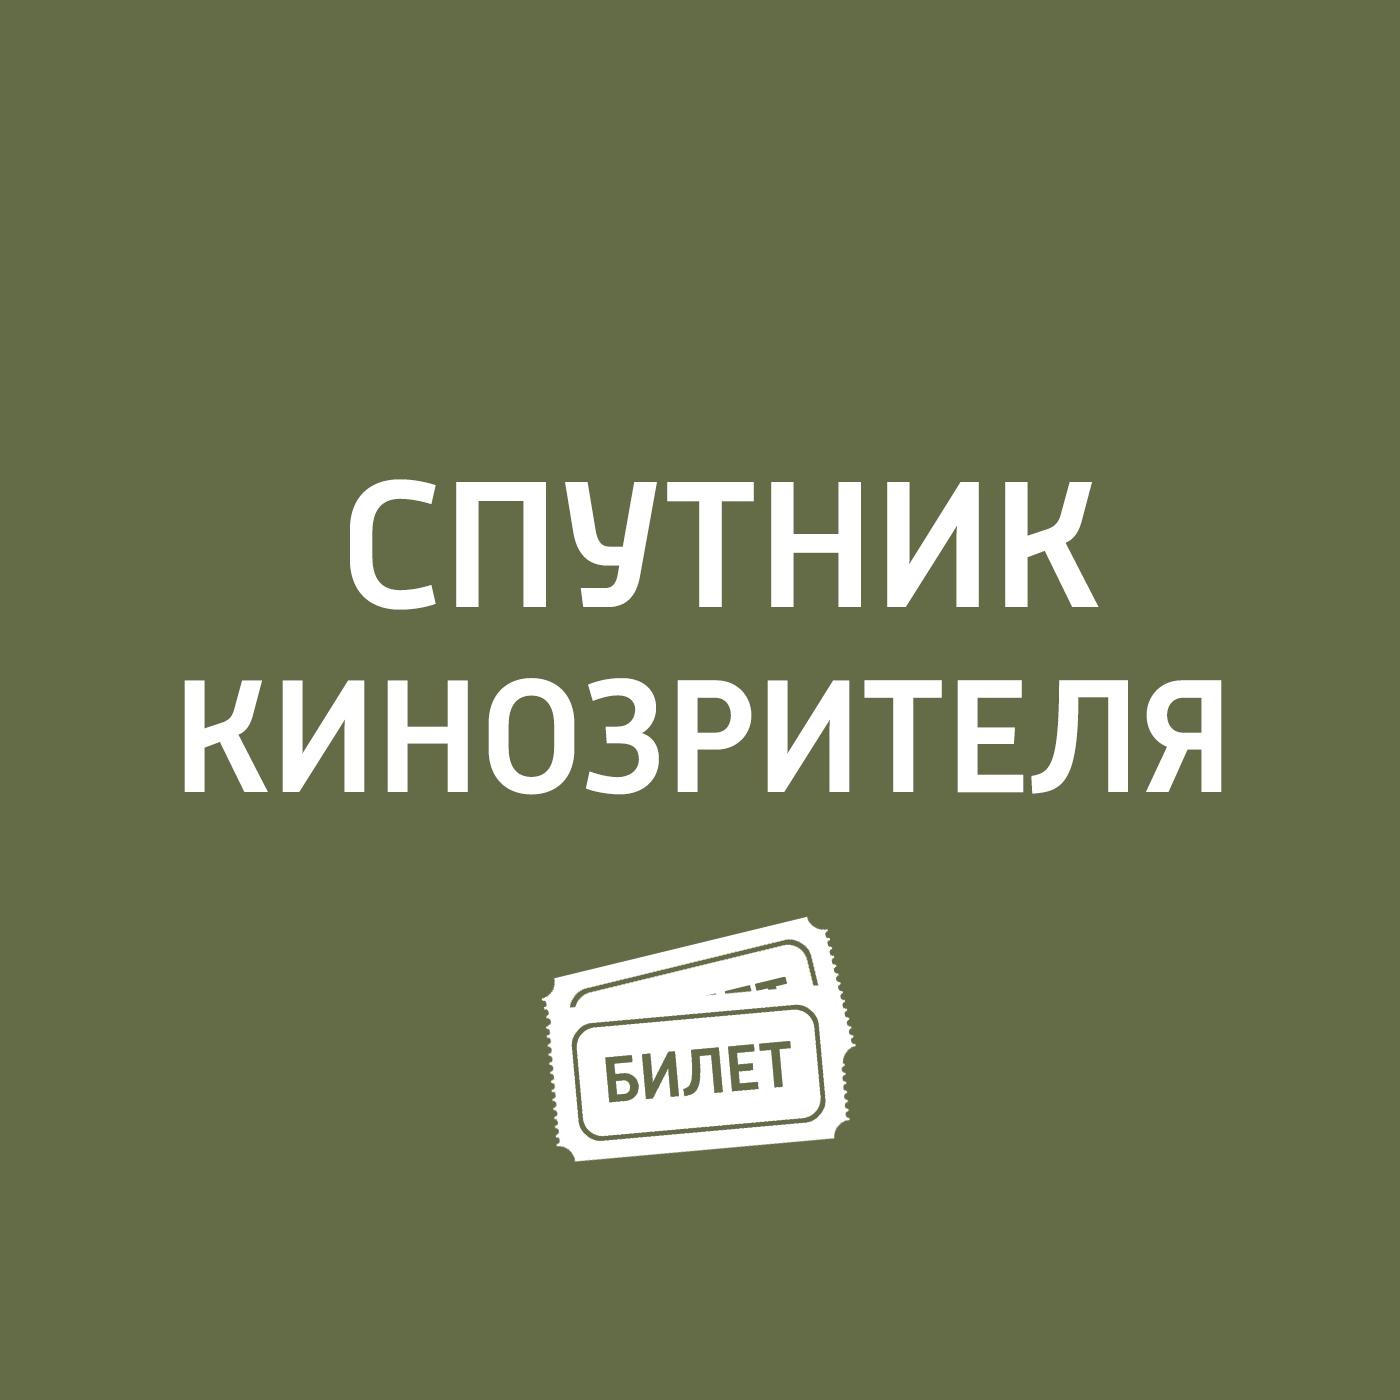 Антон Долин Лучшее. Майкл Дуглас антон мальчик щенок